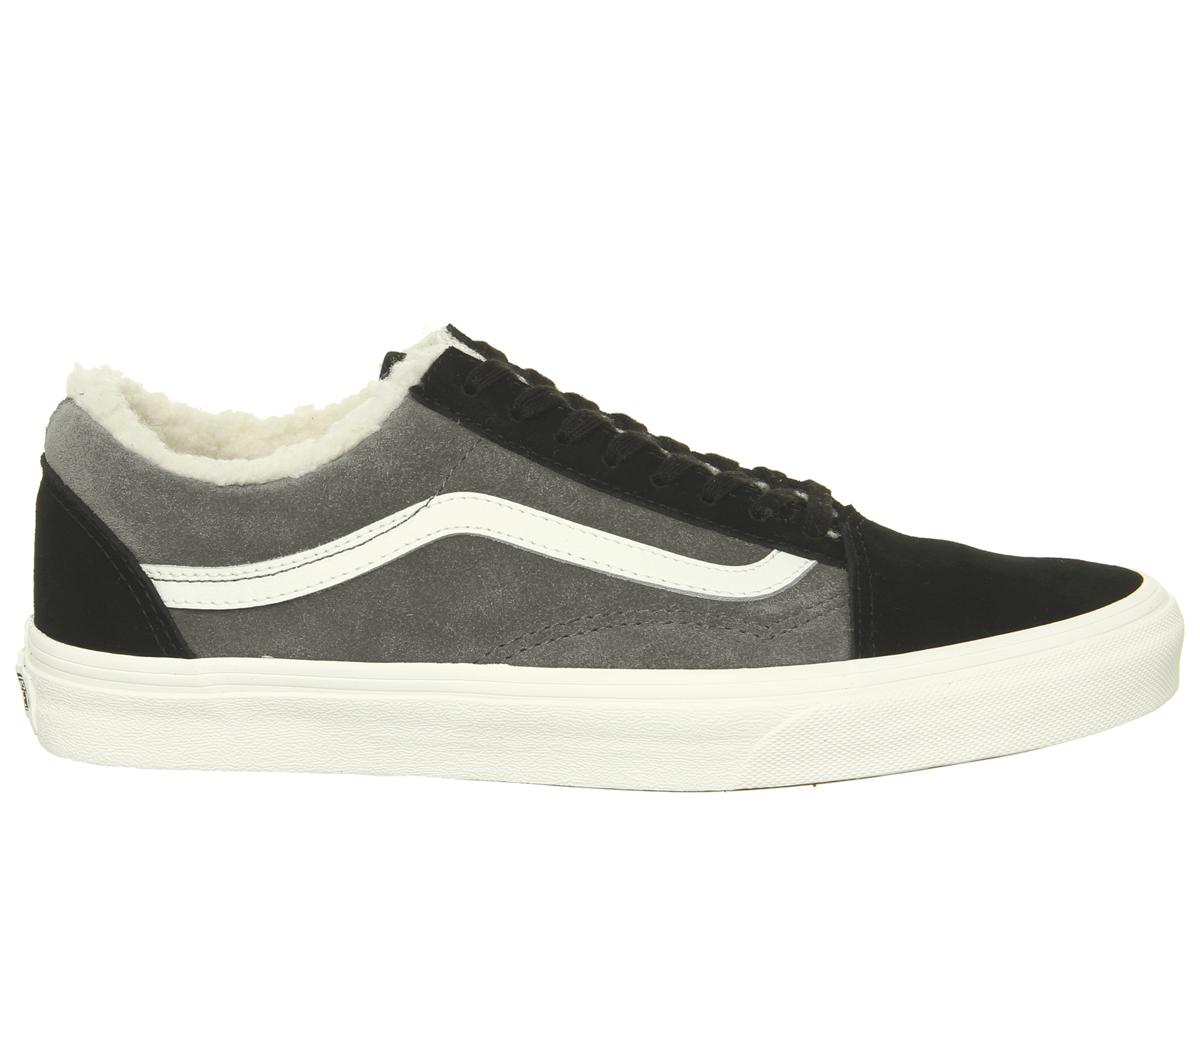 35d747c4b3e50 SENTINEL Mens Vans Old Skool formatori peltro SHERPA formatori scarpe nere